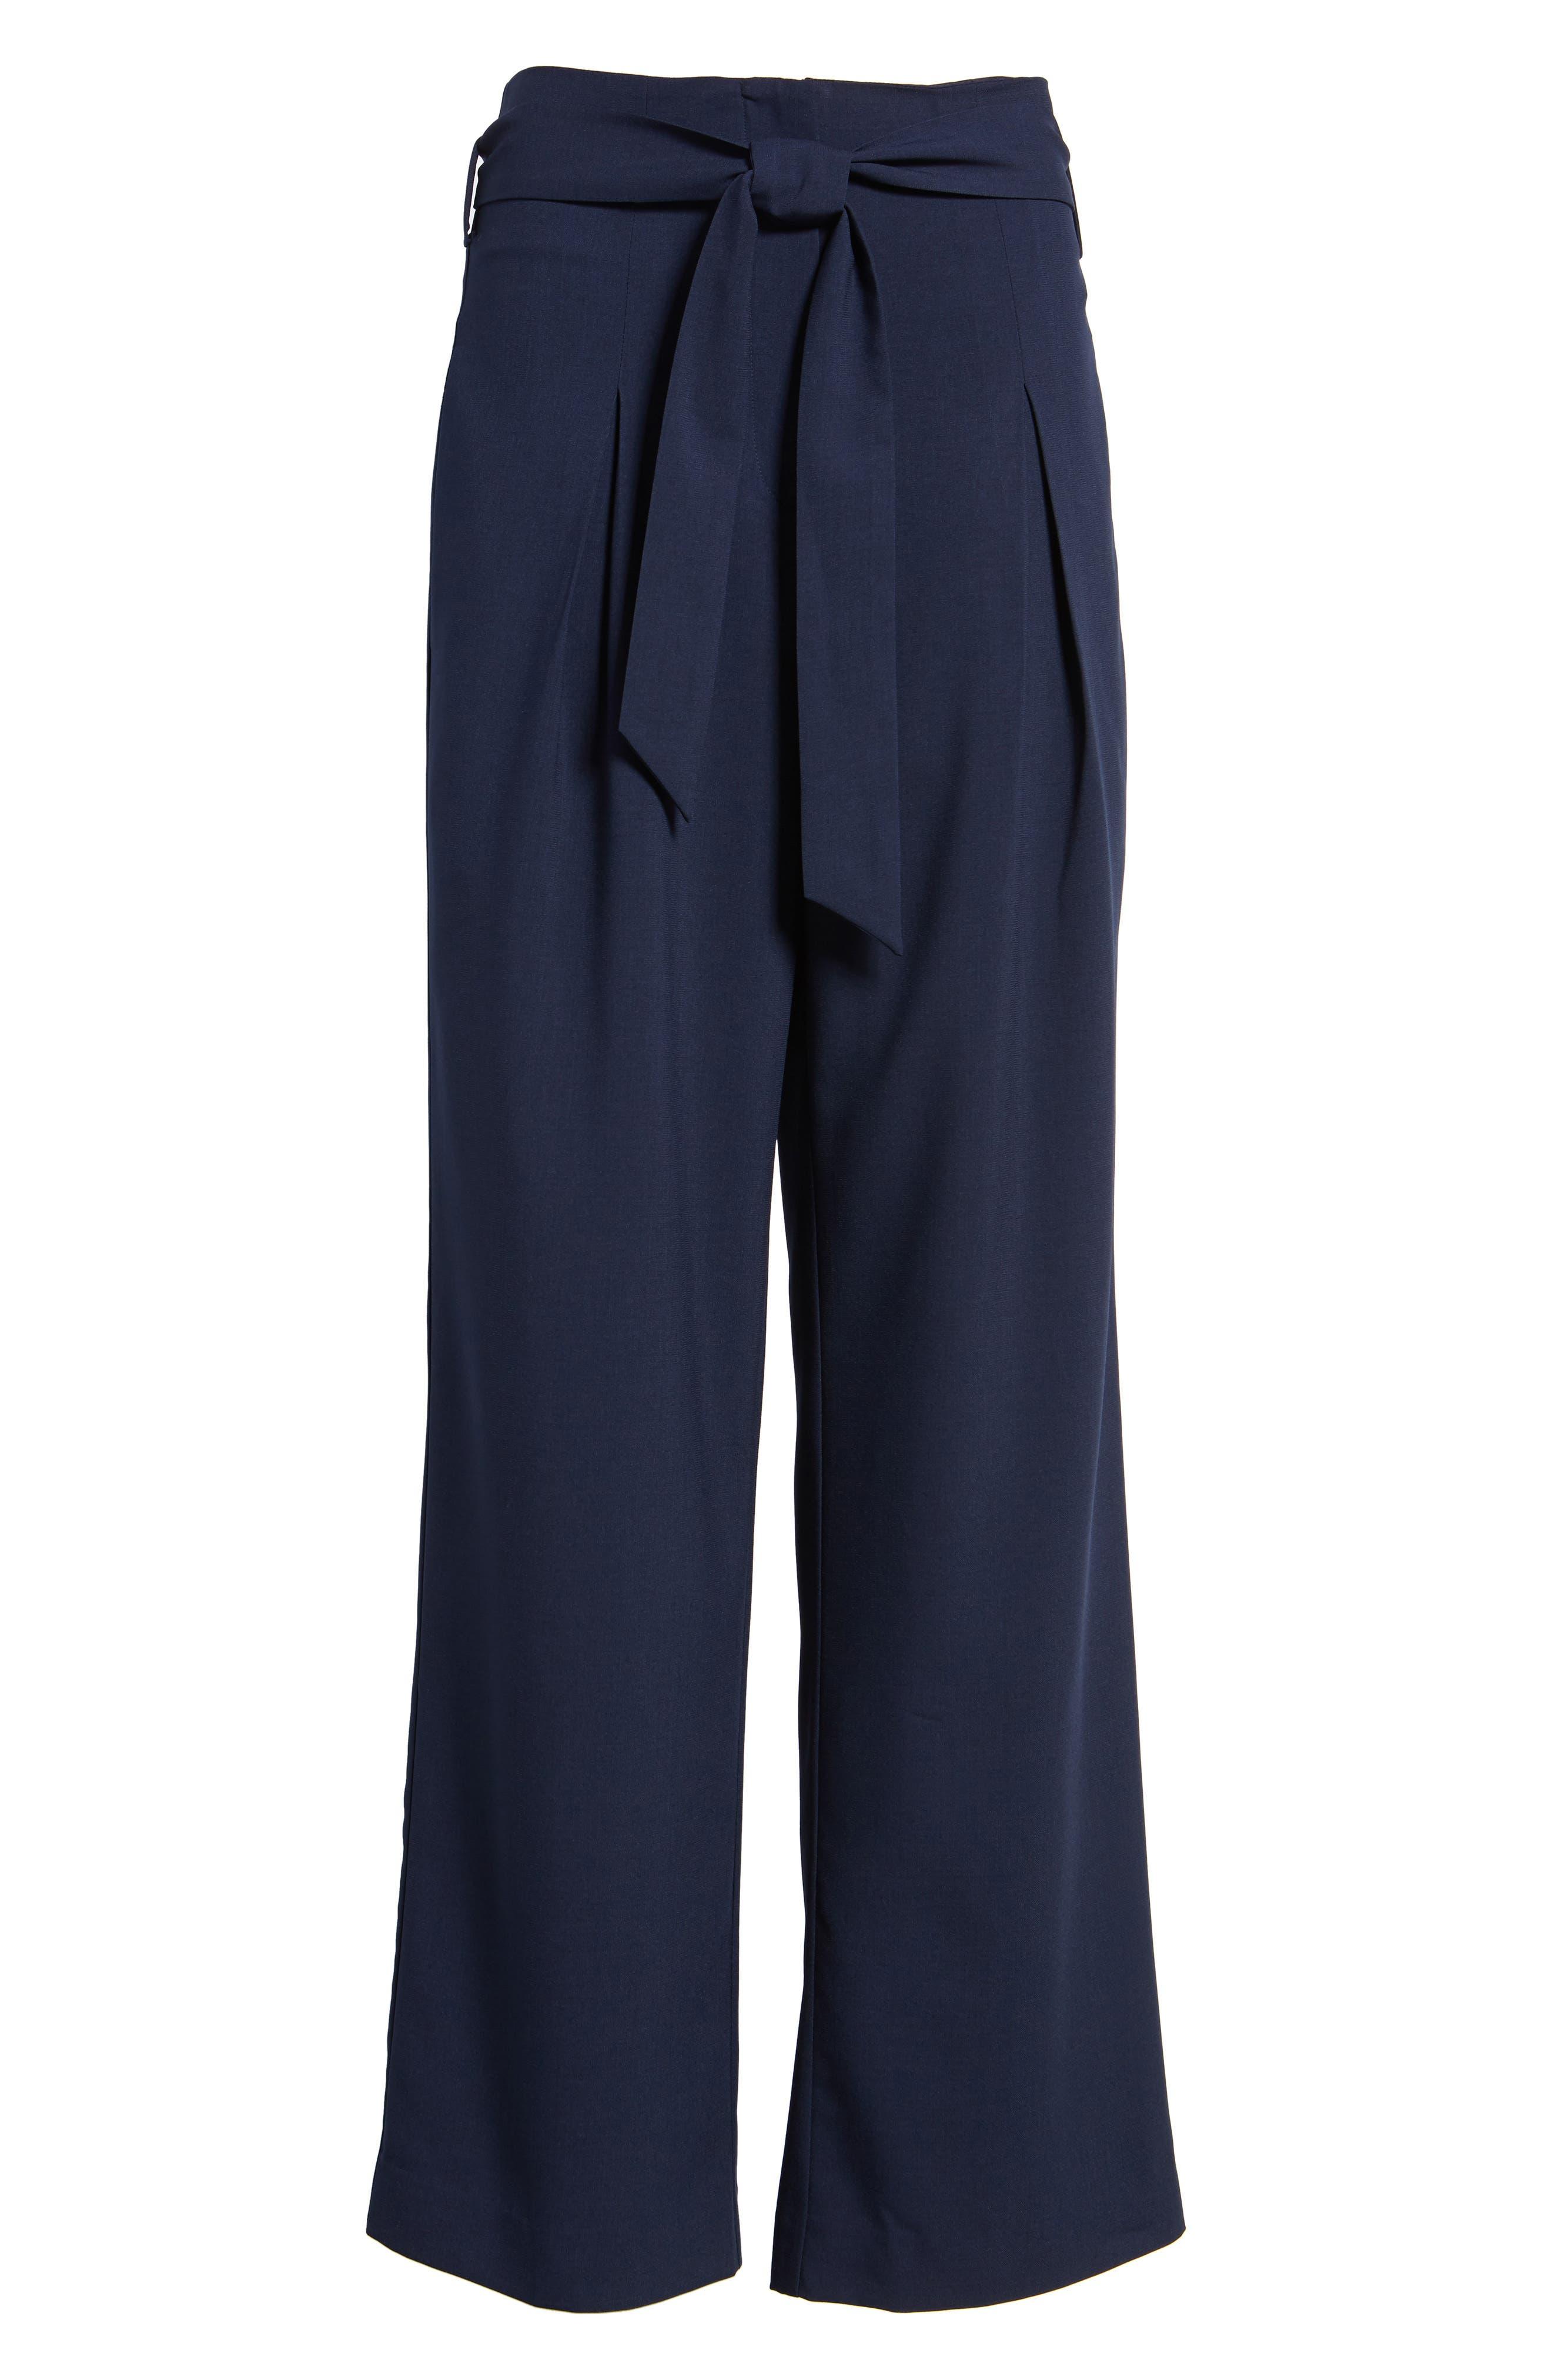 Tie Front Pants,                             Alternate thumbnail 6, color,                             Navy